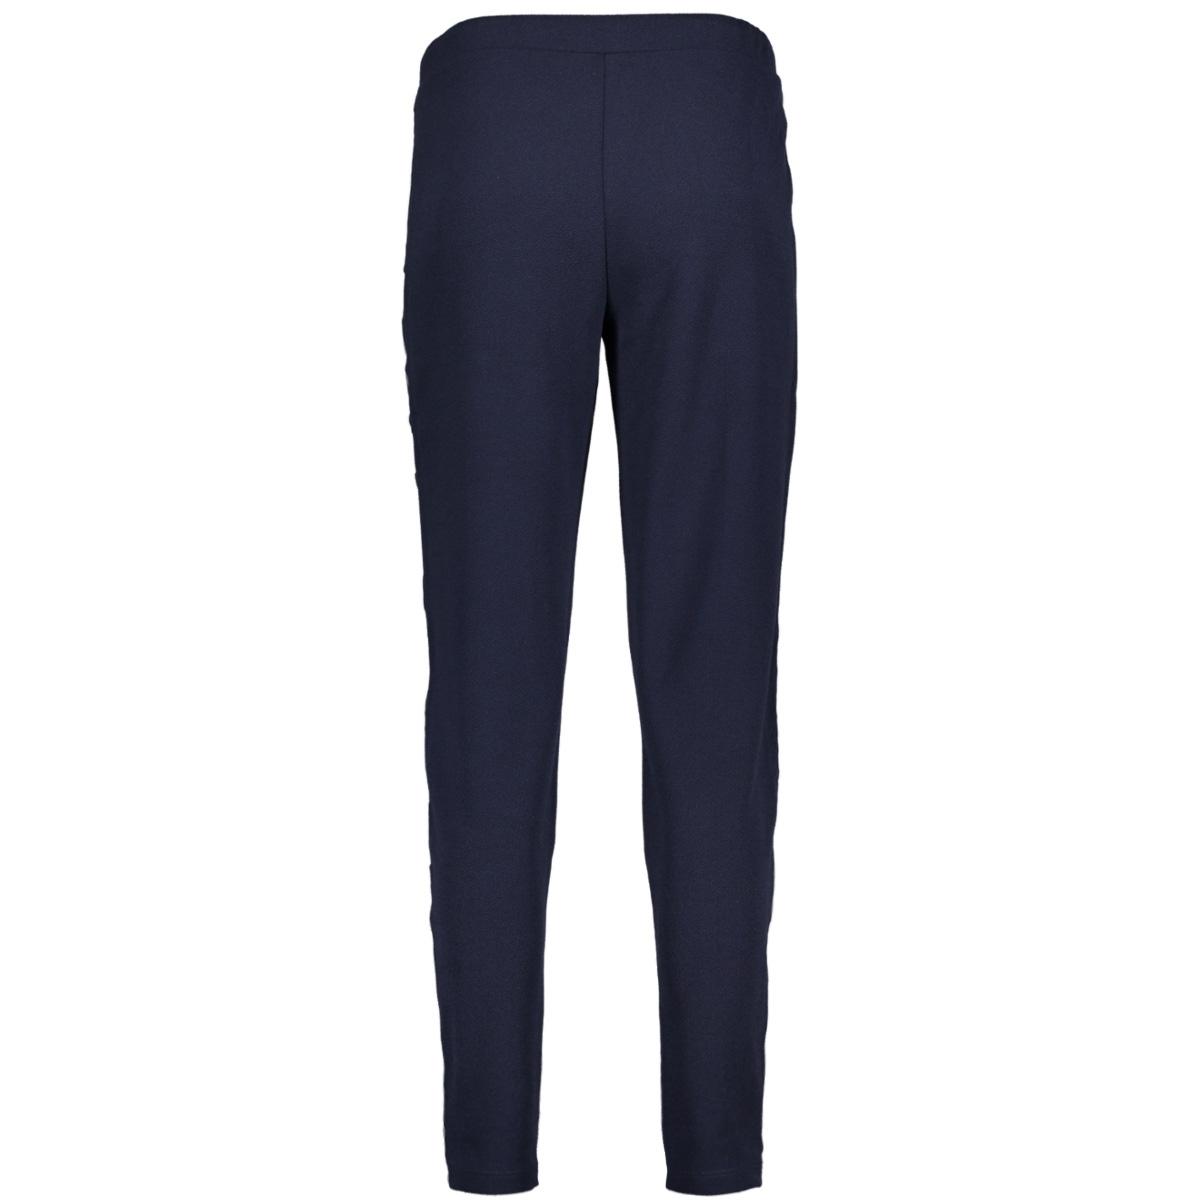 onlramona pants jrs 15157042 only broek night sky/bright whi